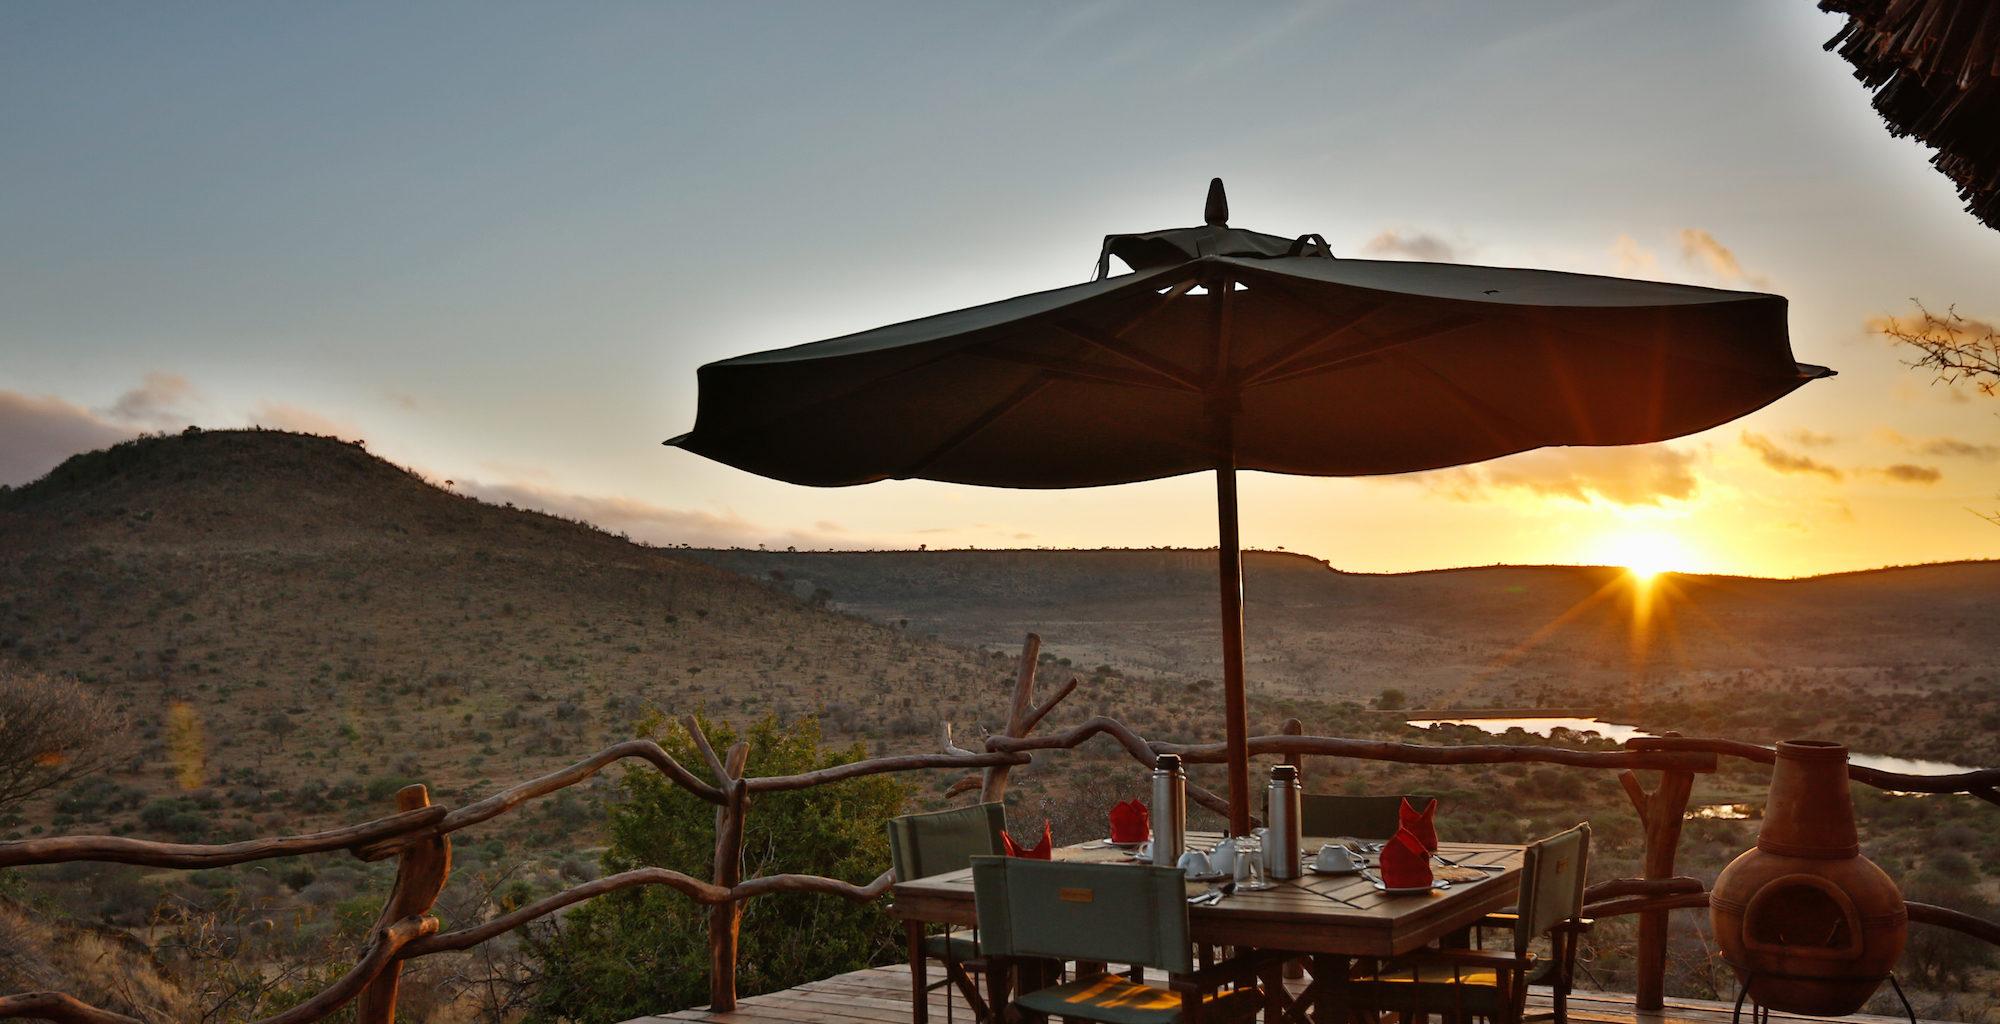 Loisaba Star Beds Kenya Deck